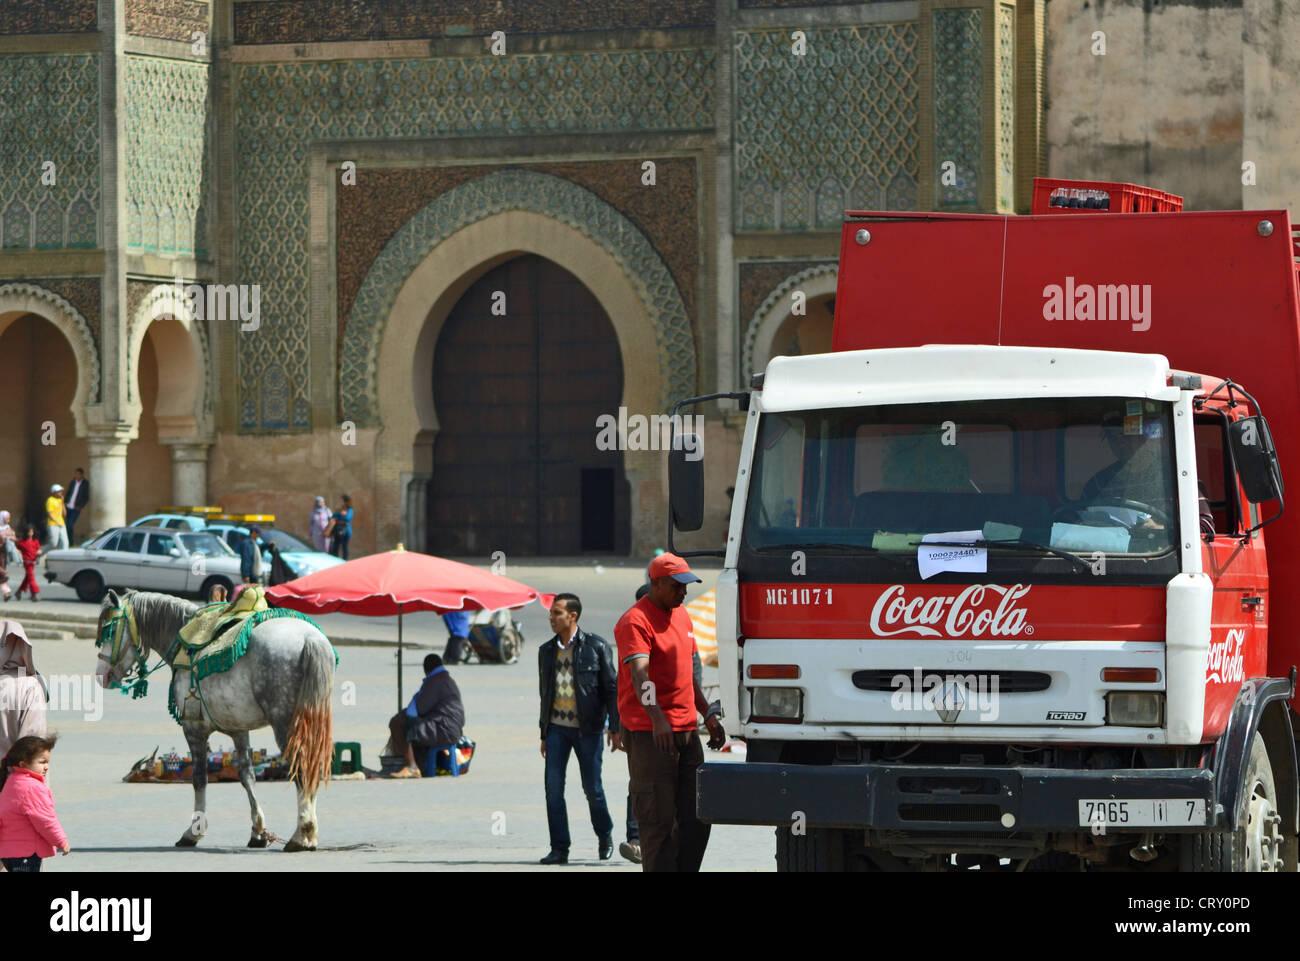 Coca cola truck delivering drinks in Meknes, Morocco - Stock Image